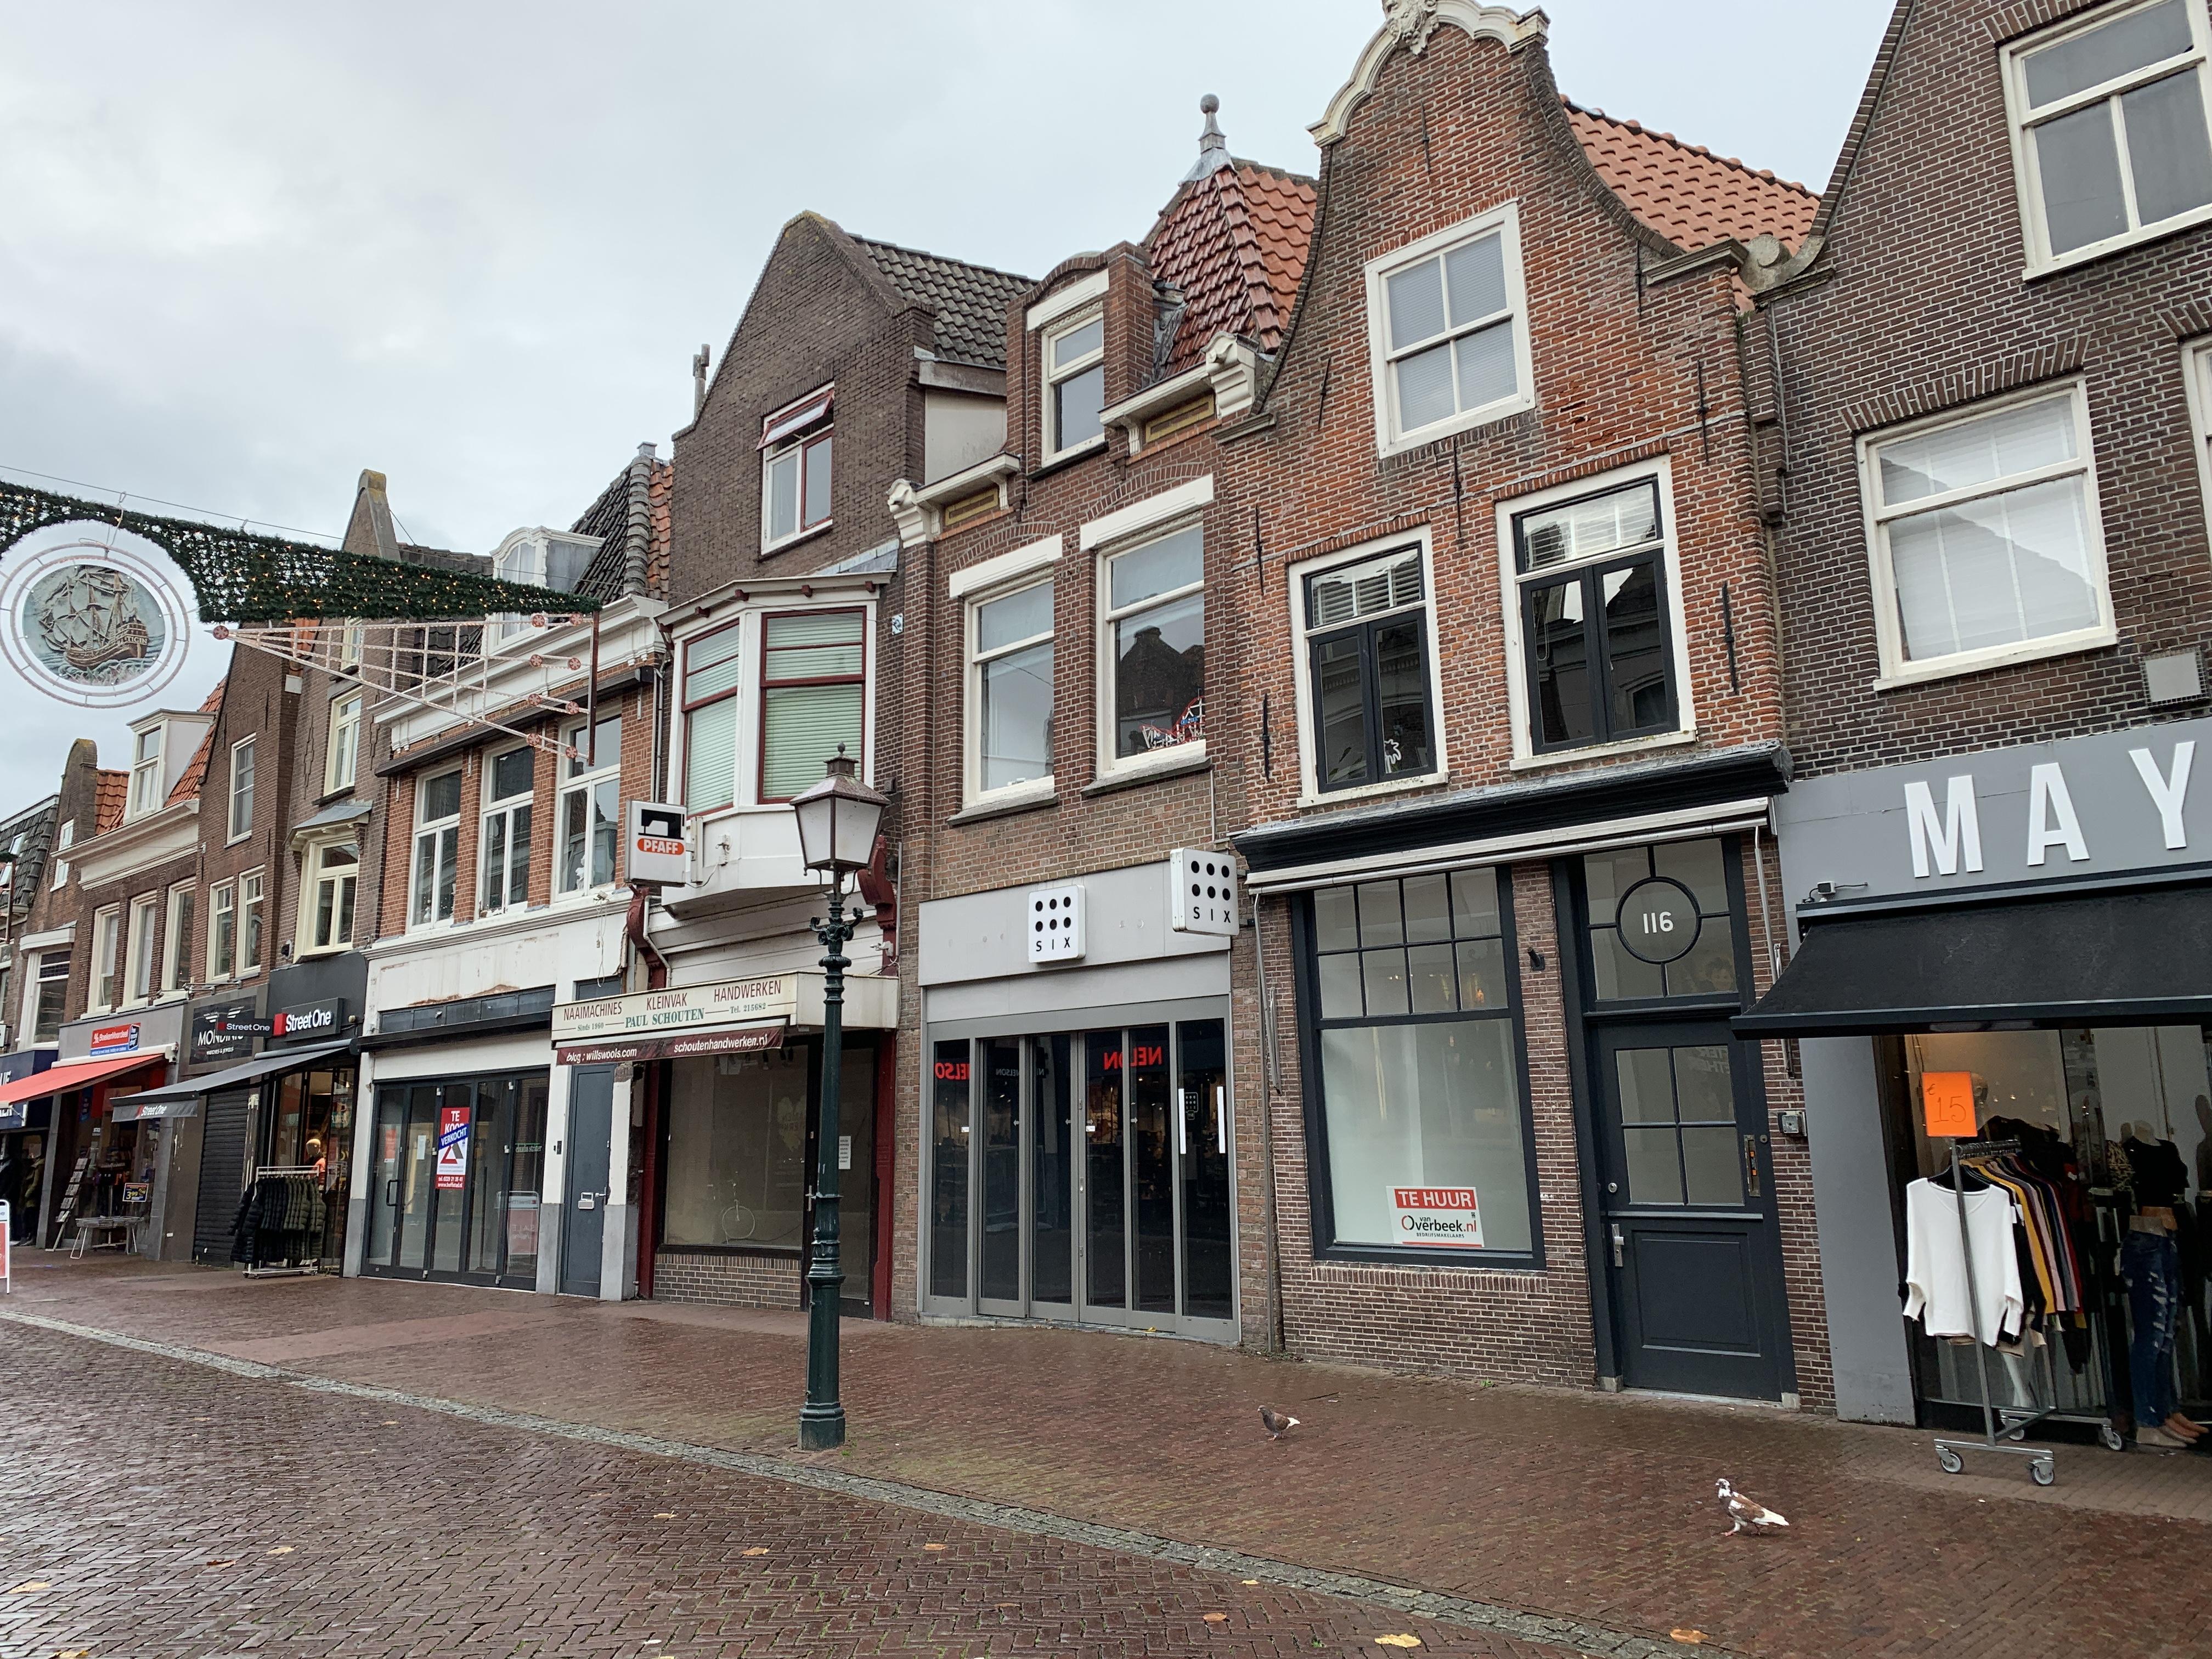 Stelling: Eigenaars leegstaande winkel moeten pand ombouwen tot woning